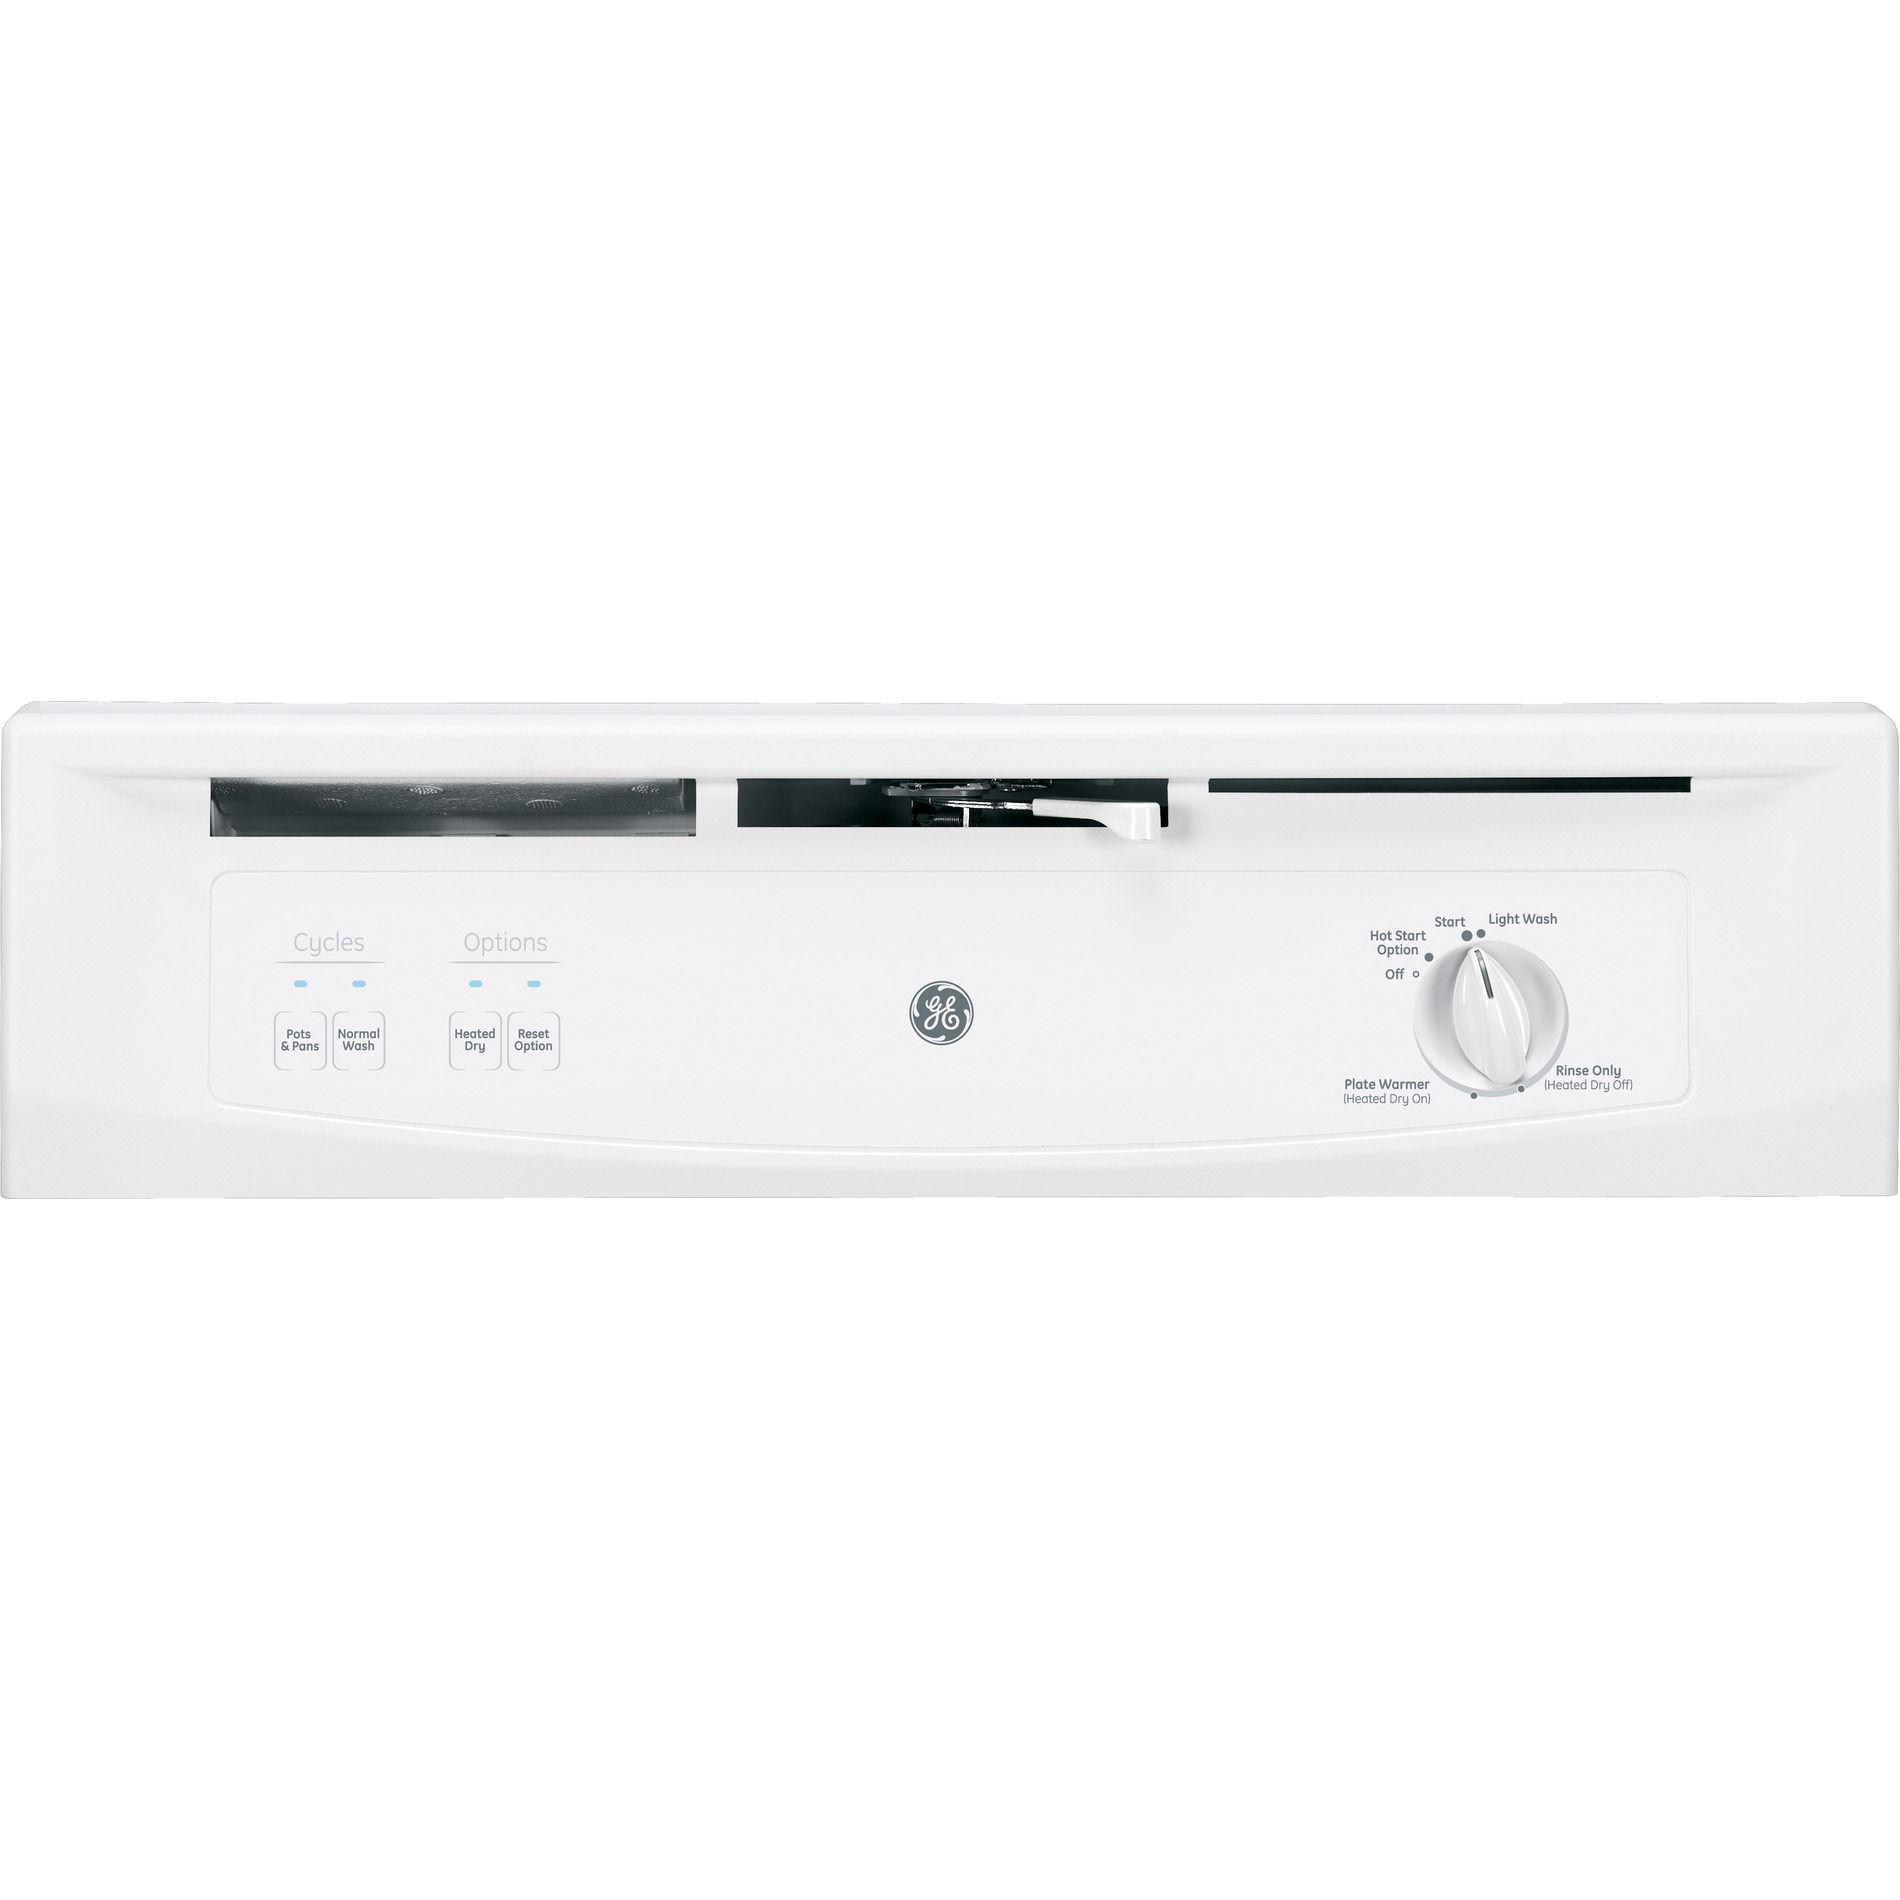 "GE Appliances GSM2200VWW 24"" Under-the-Sink Built-In Dishwasher - White"